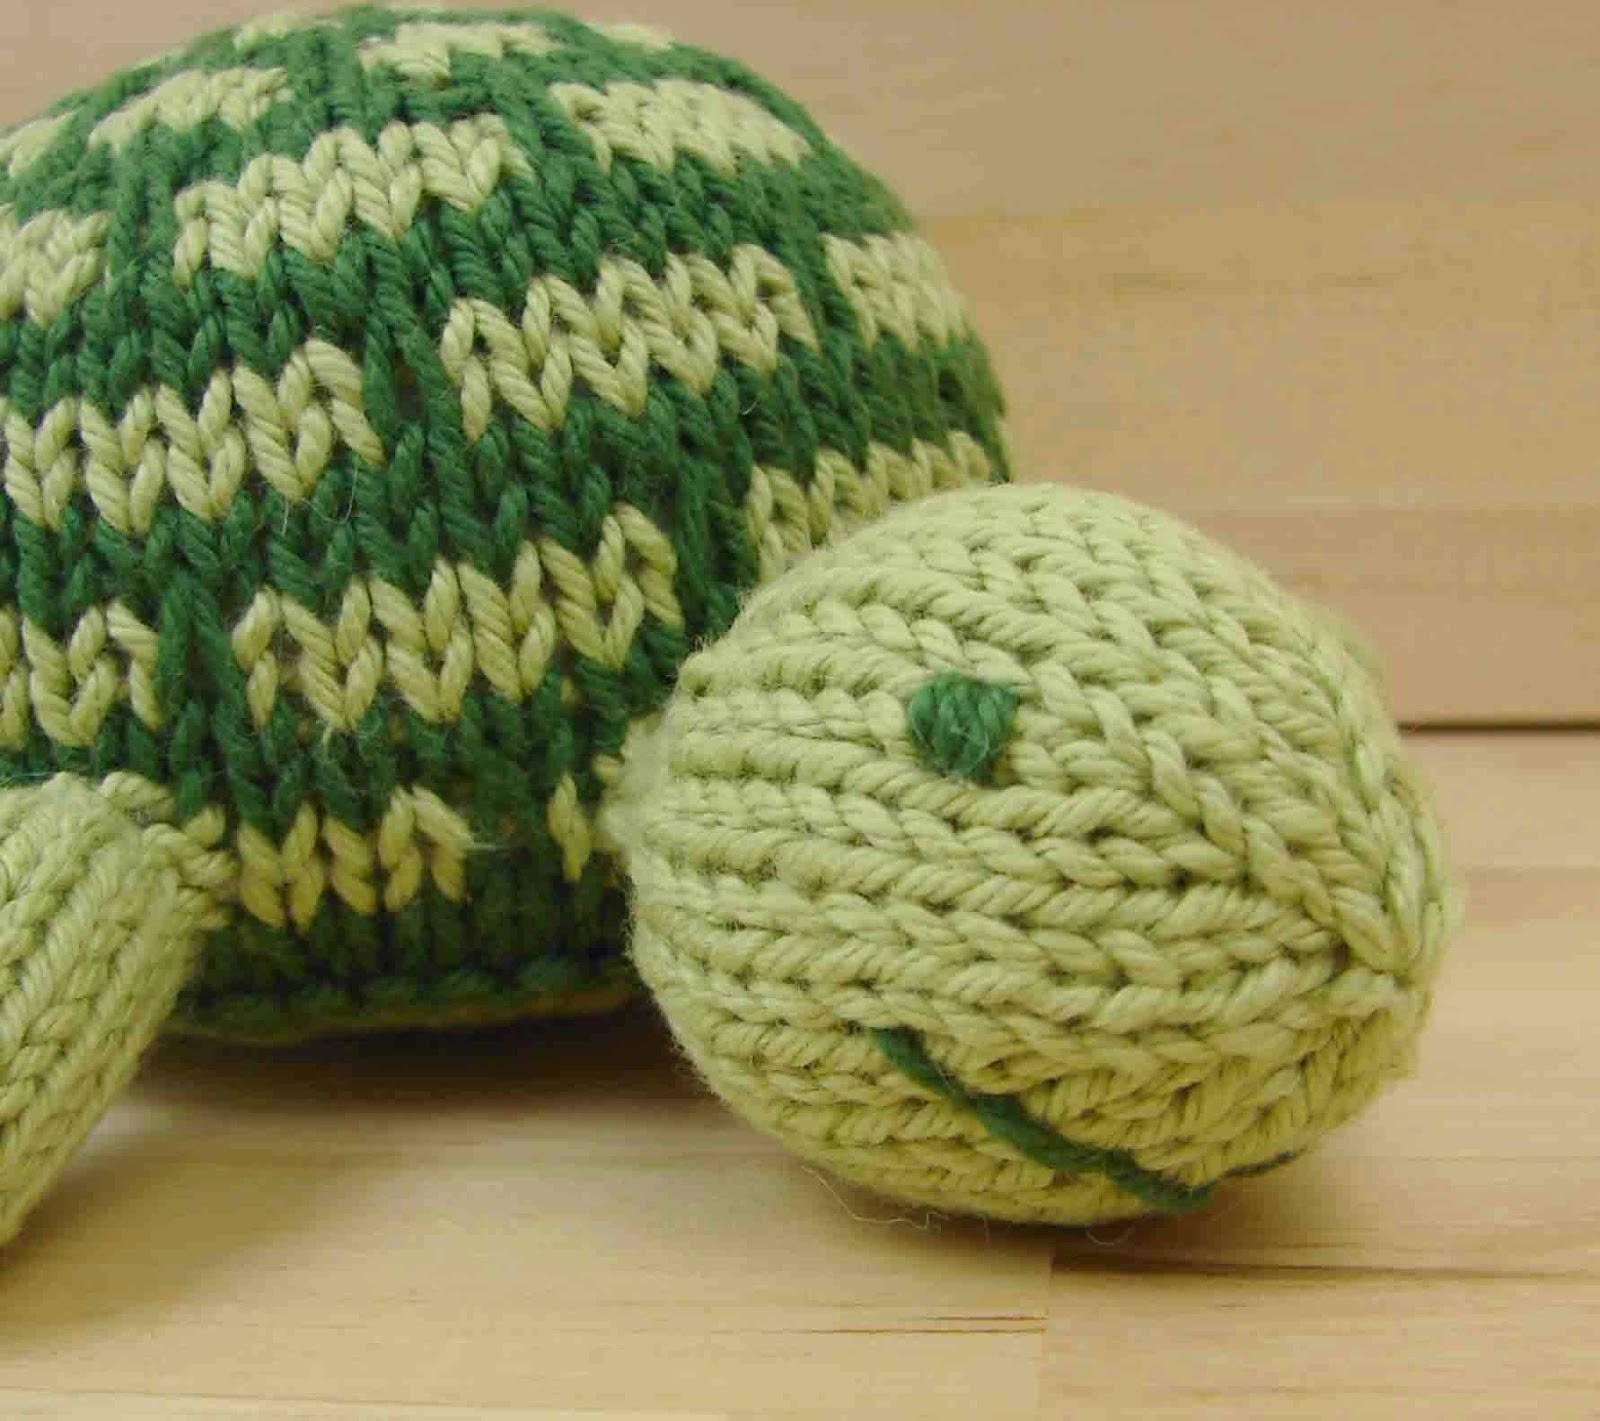 Knitting Patterns Turtle Toy : Auntie Ems Studio: August 2016